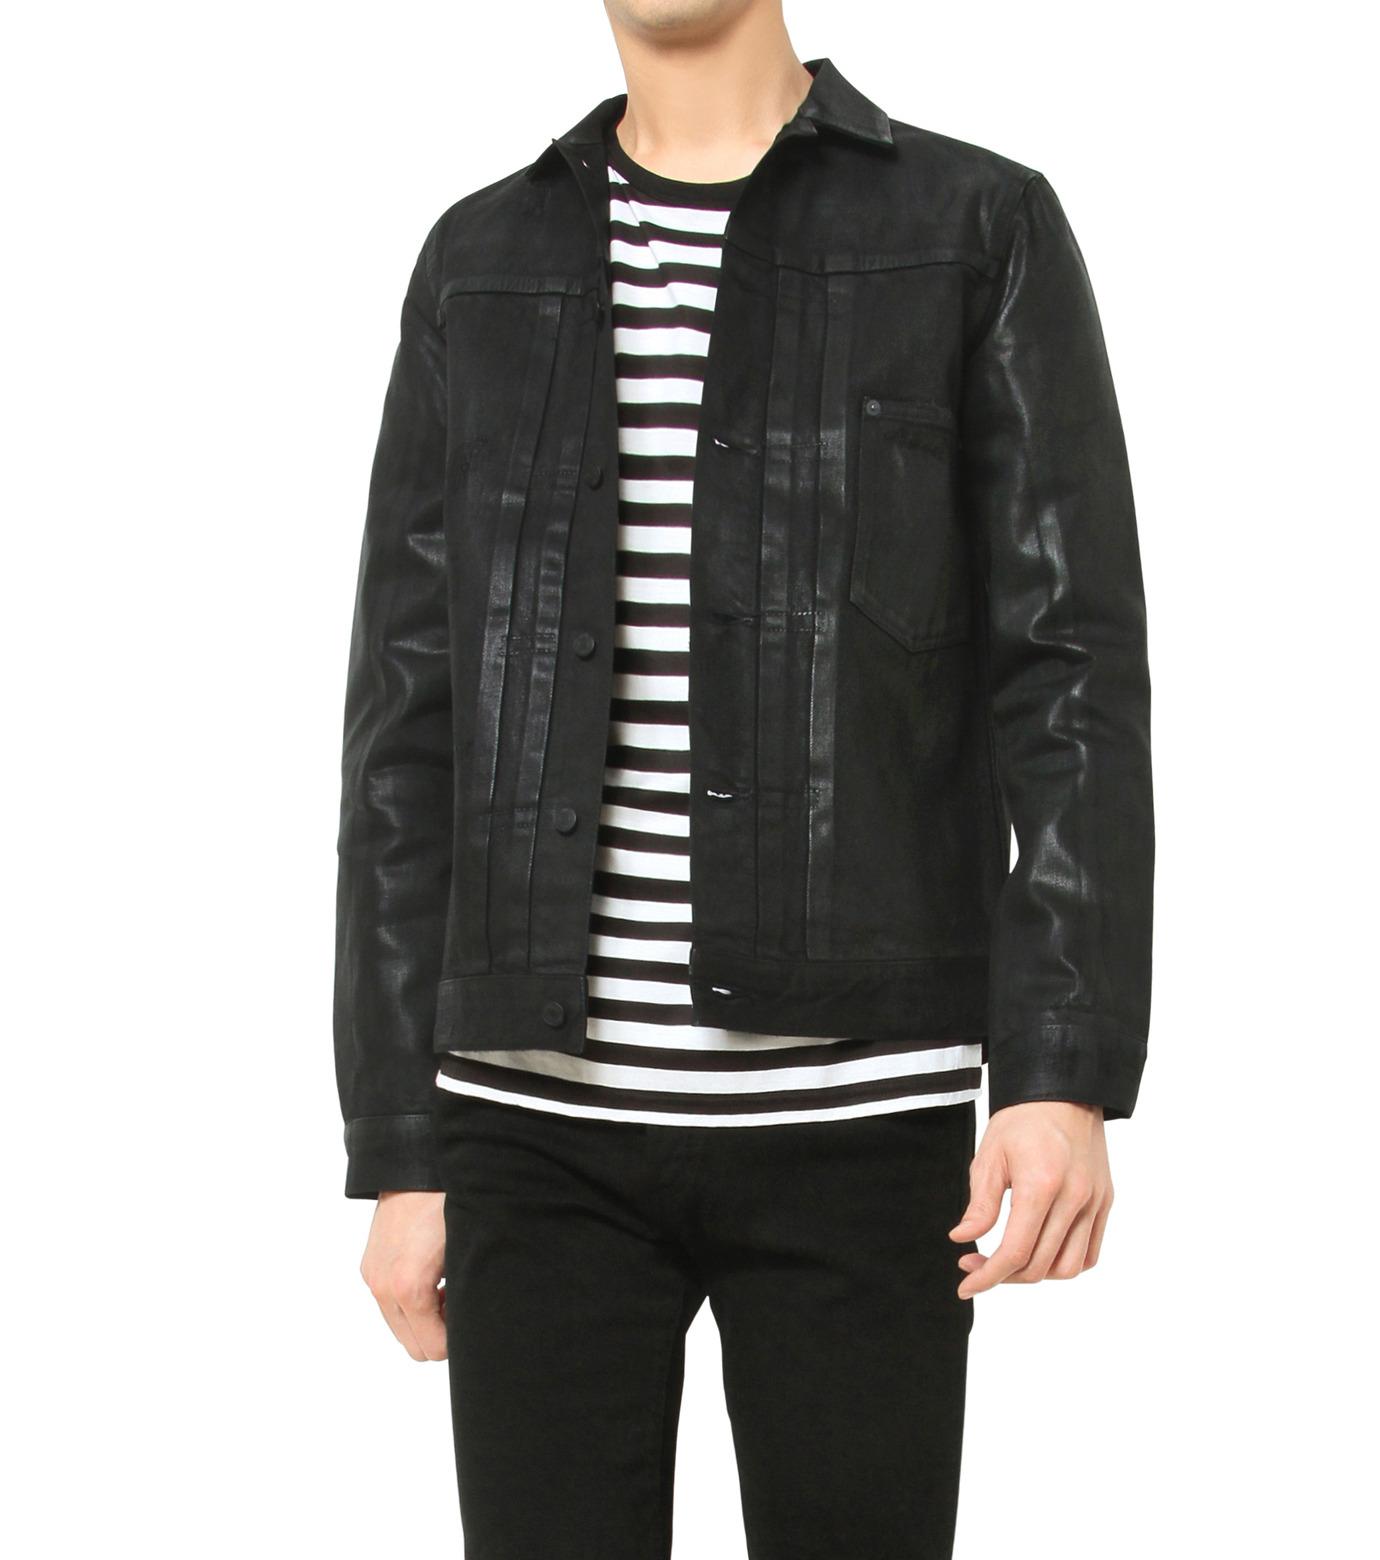 HL HEDDIE LOVU(エイチエル・エディールーヴ)のCOATING BLACK DENIM JACKET-BLACK(ジャケット/jacket)-17A94001-13 拡大詳細画像5